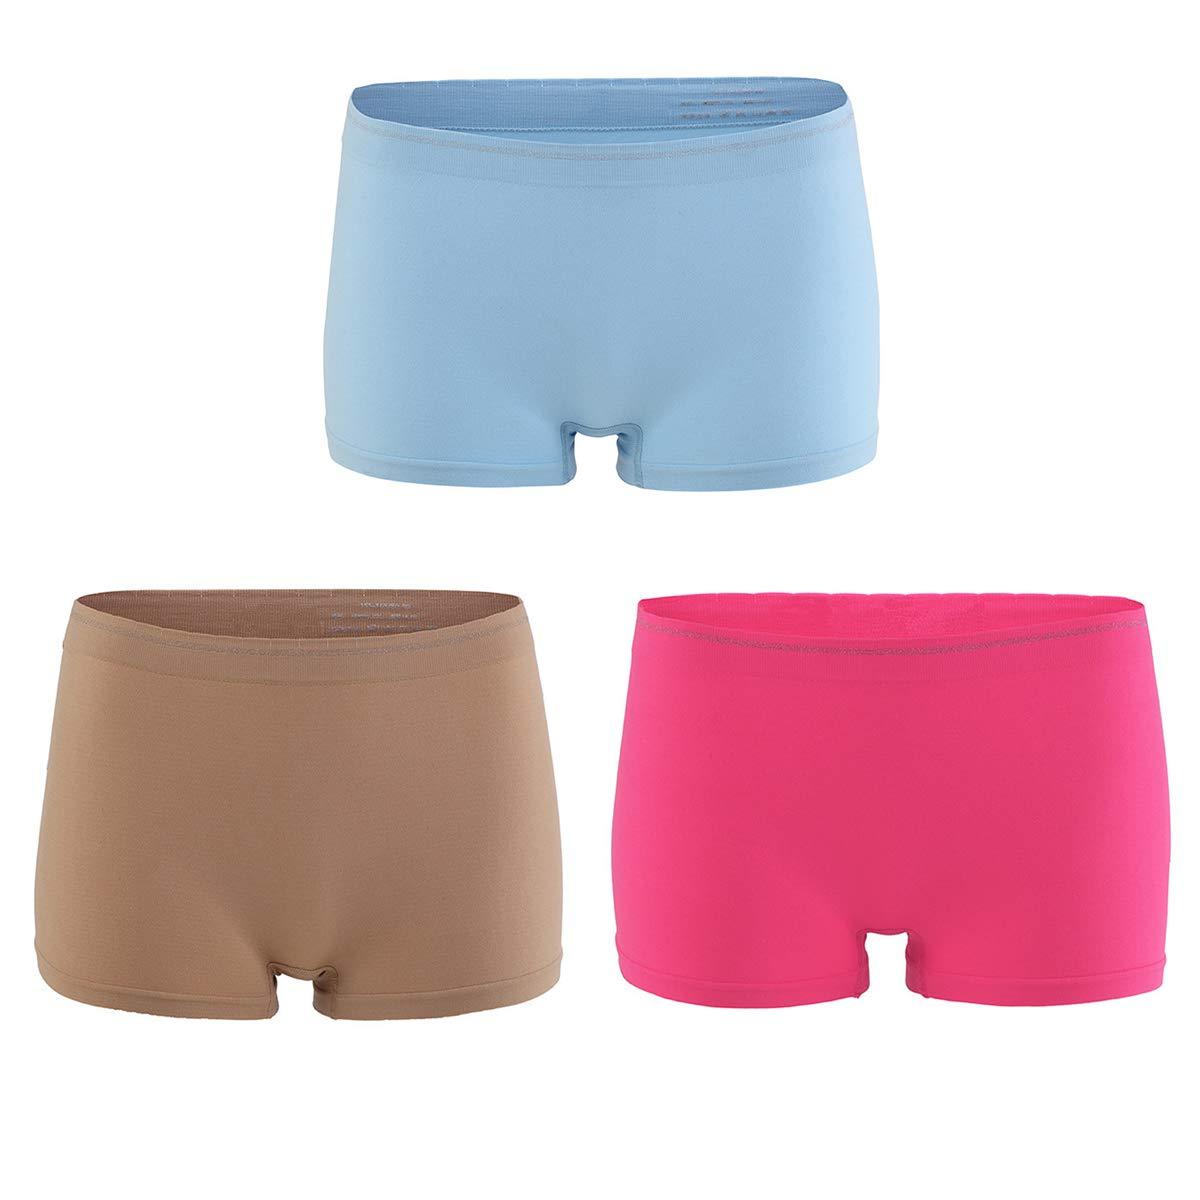 BaiTao Women/'s Seamless Nylon Panties 3 Pack Underwear Soft Breathable Boyshorts